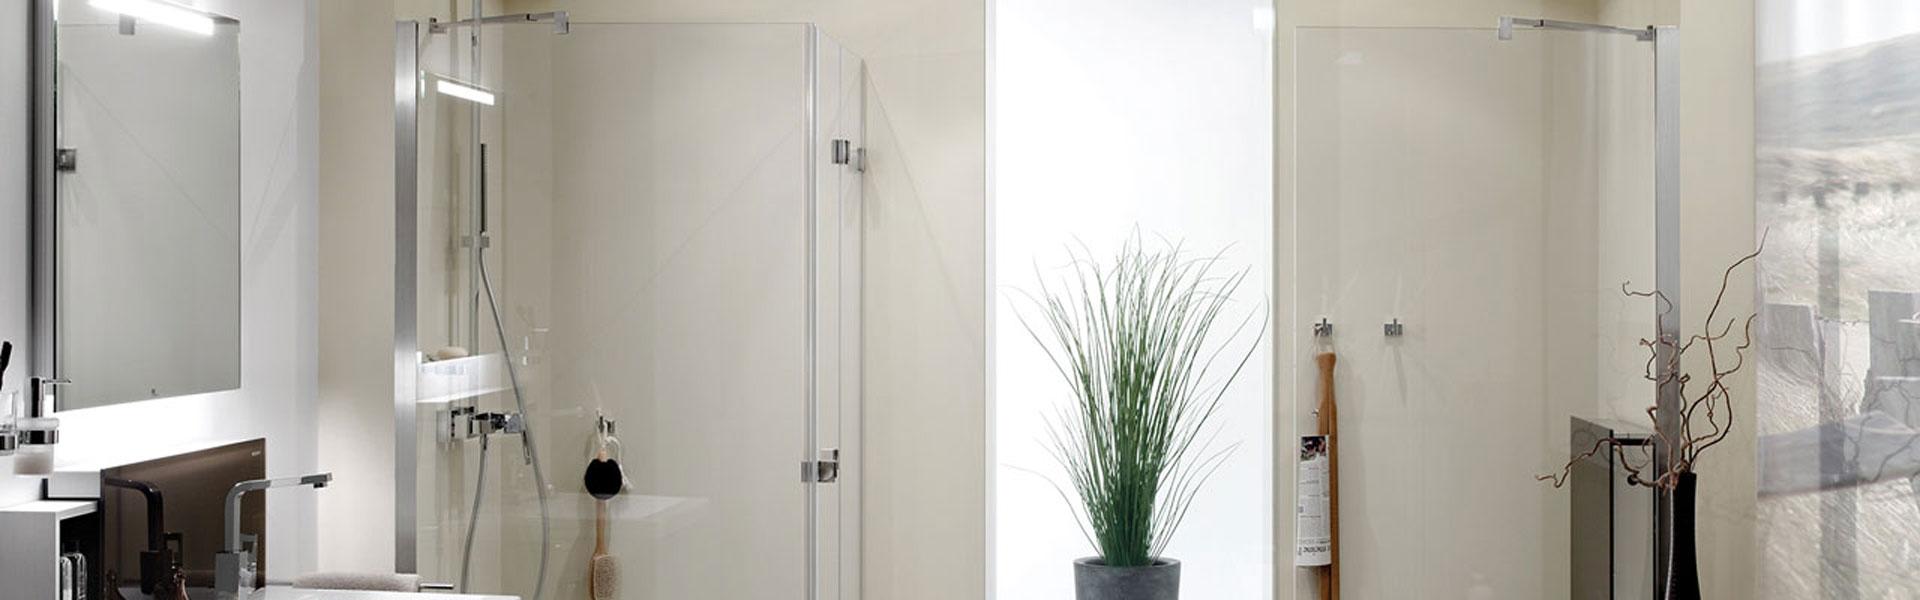 glas nach ma f rs badezimmer aus der glaserei winkler. Black Bedroom Furniture Sets. Home Design Ideas